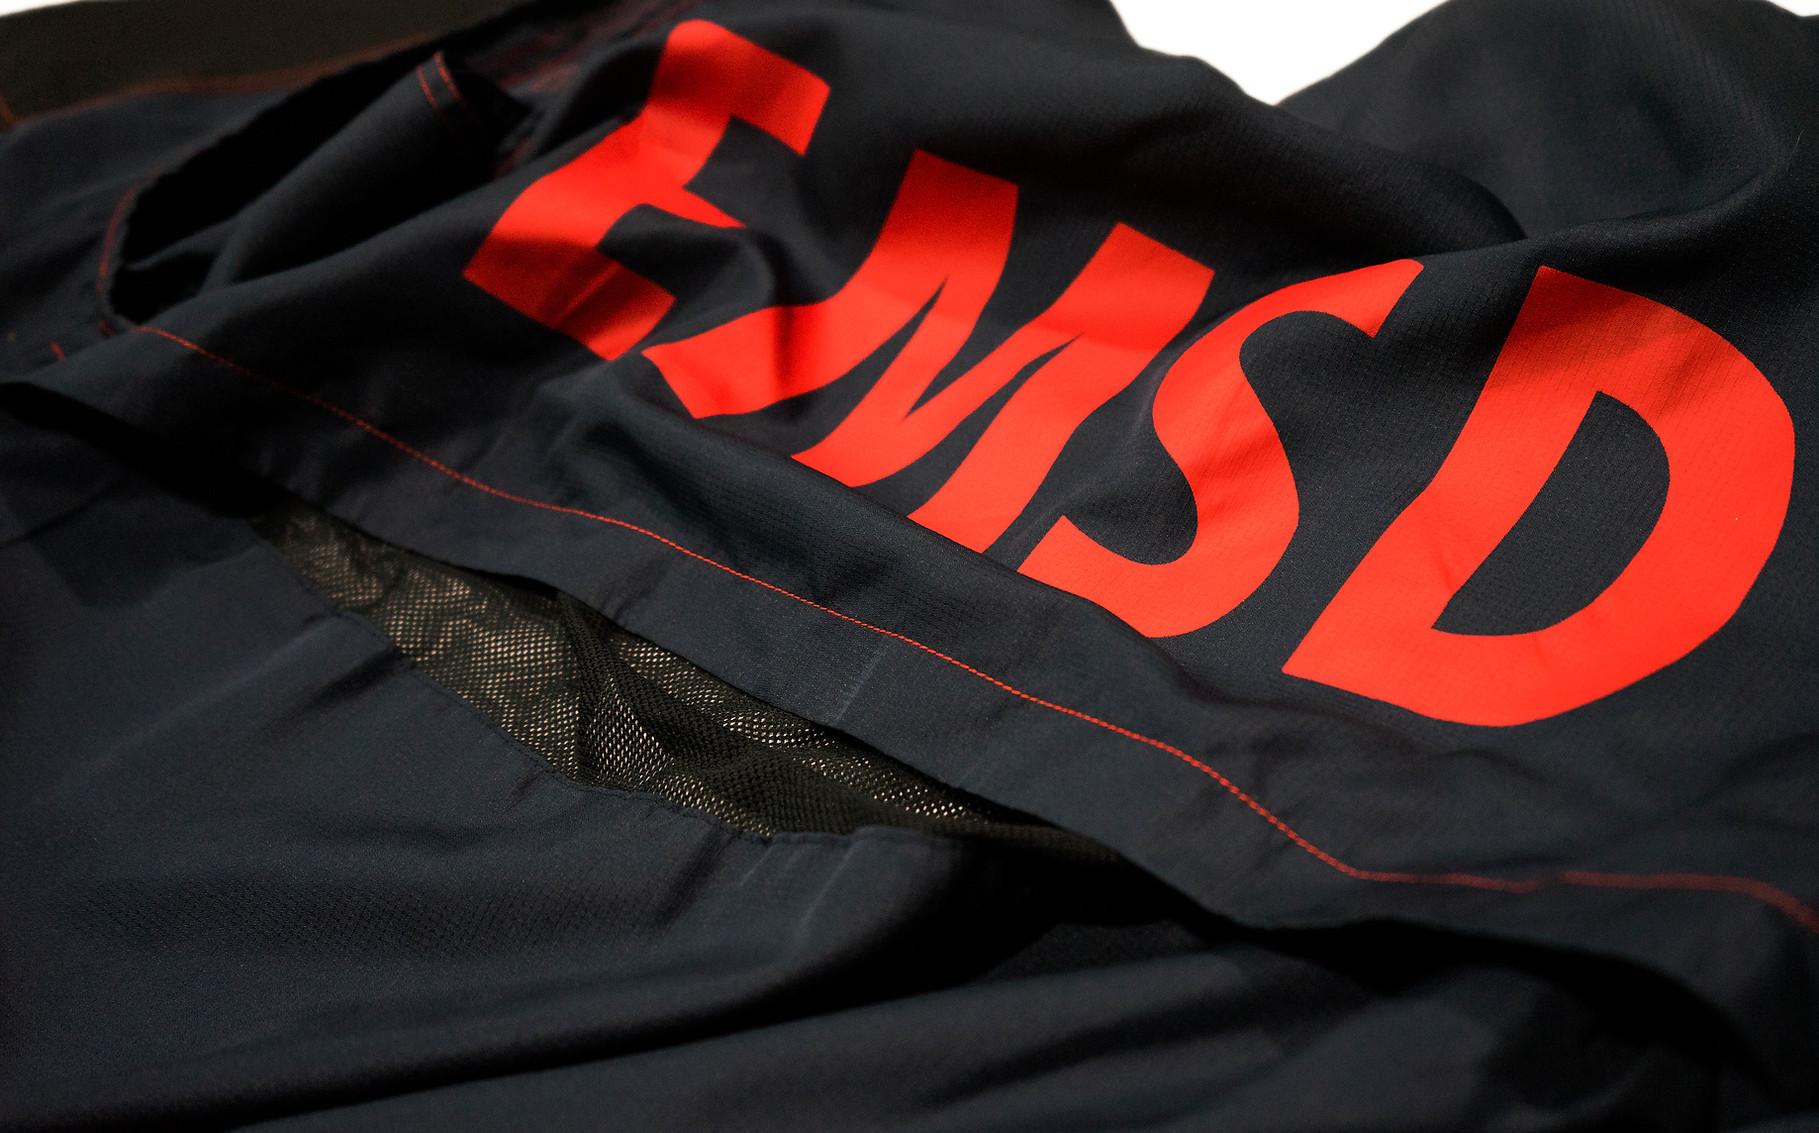 EMSD - 2 - 1.jpg